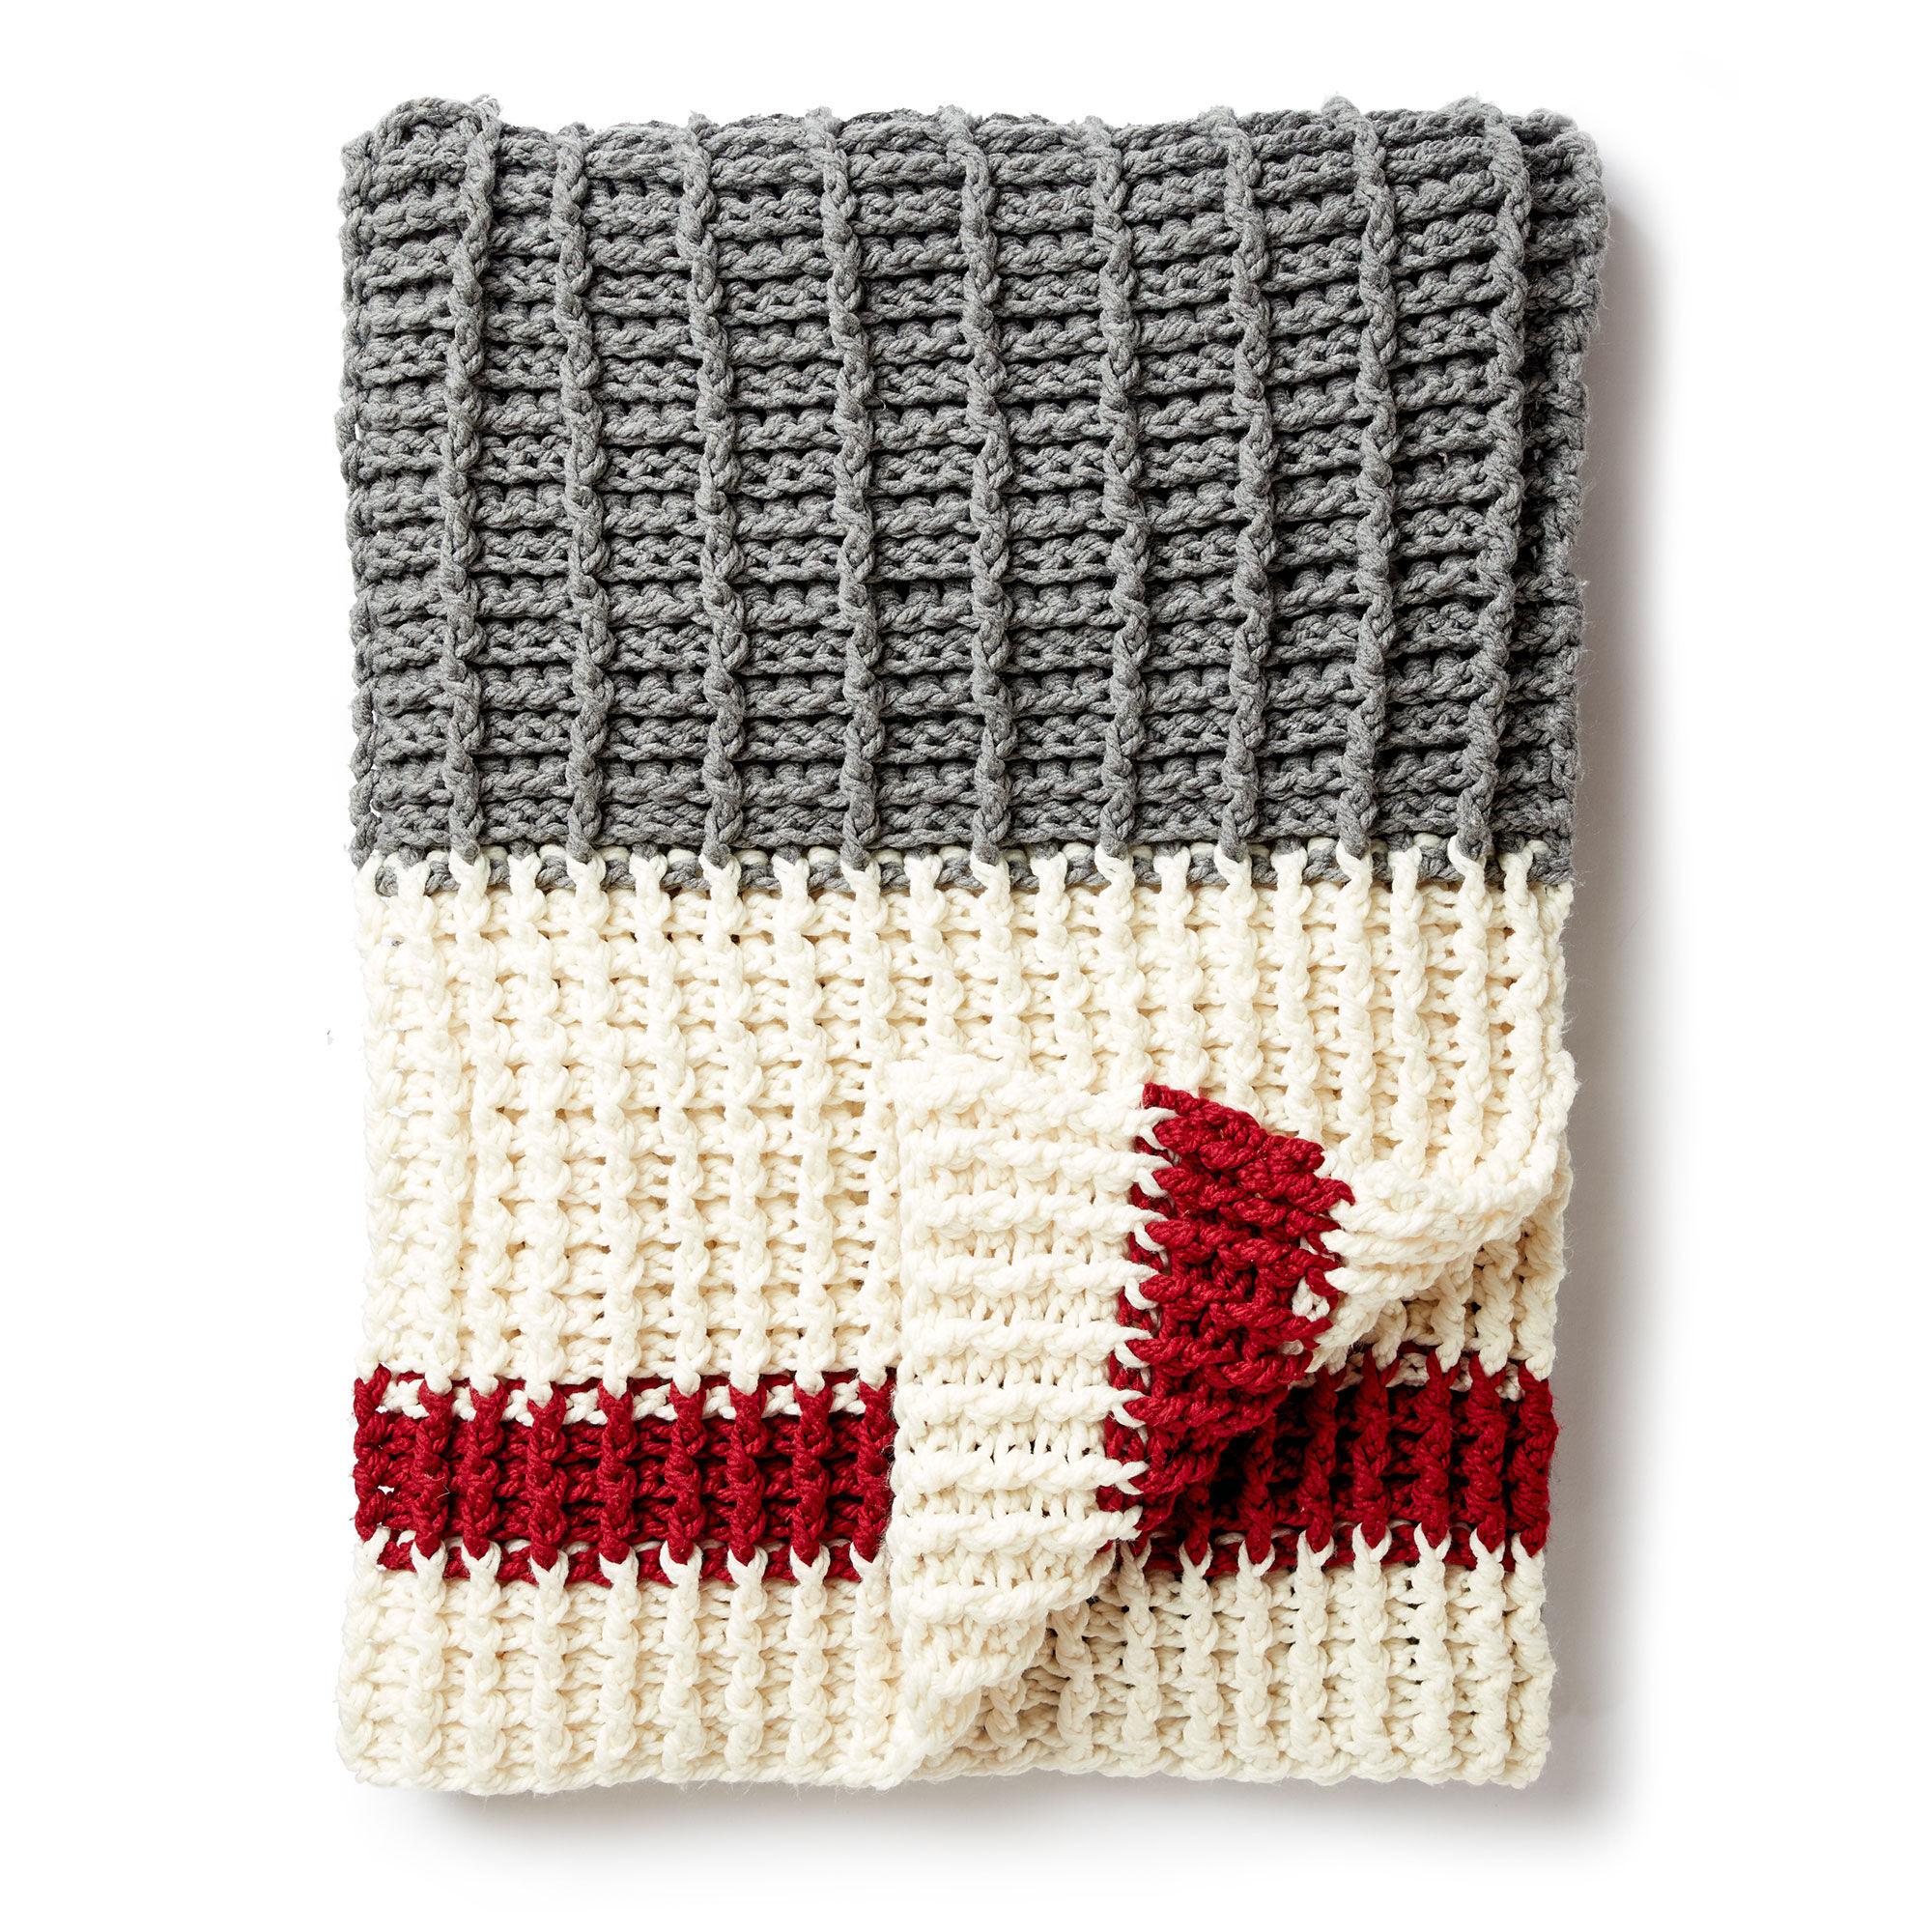 Bernat Lumberjack Crochet Throw | Yarnspirations